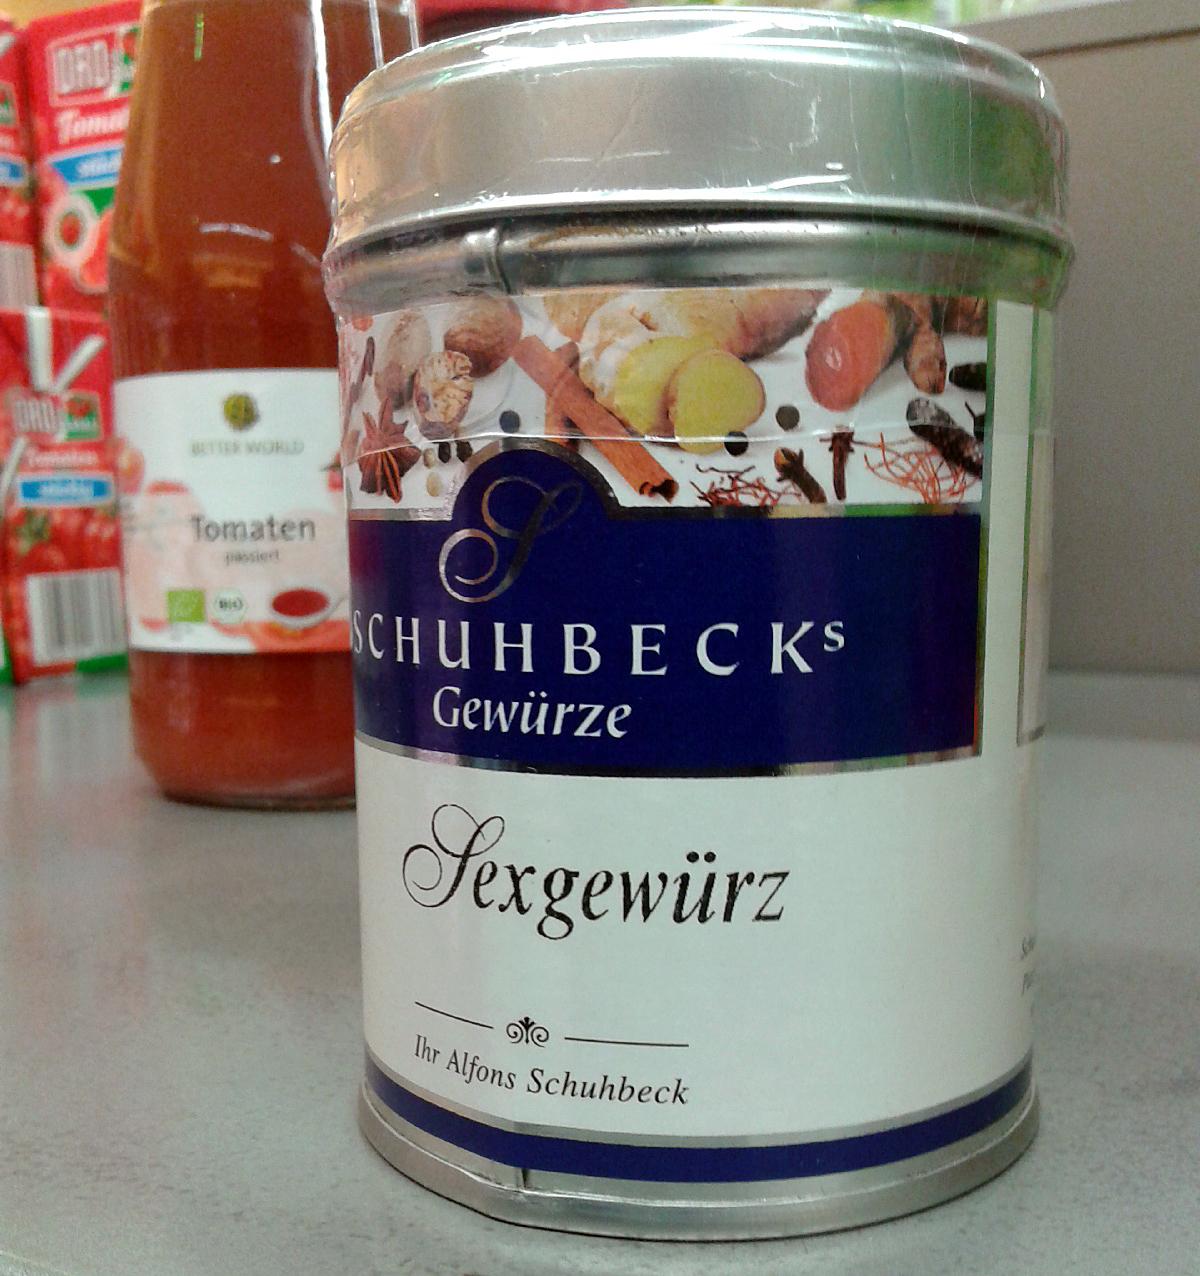 schuhbeck